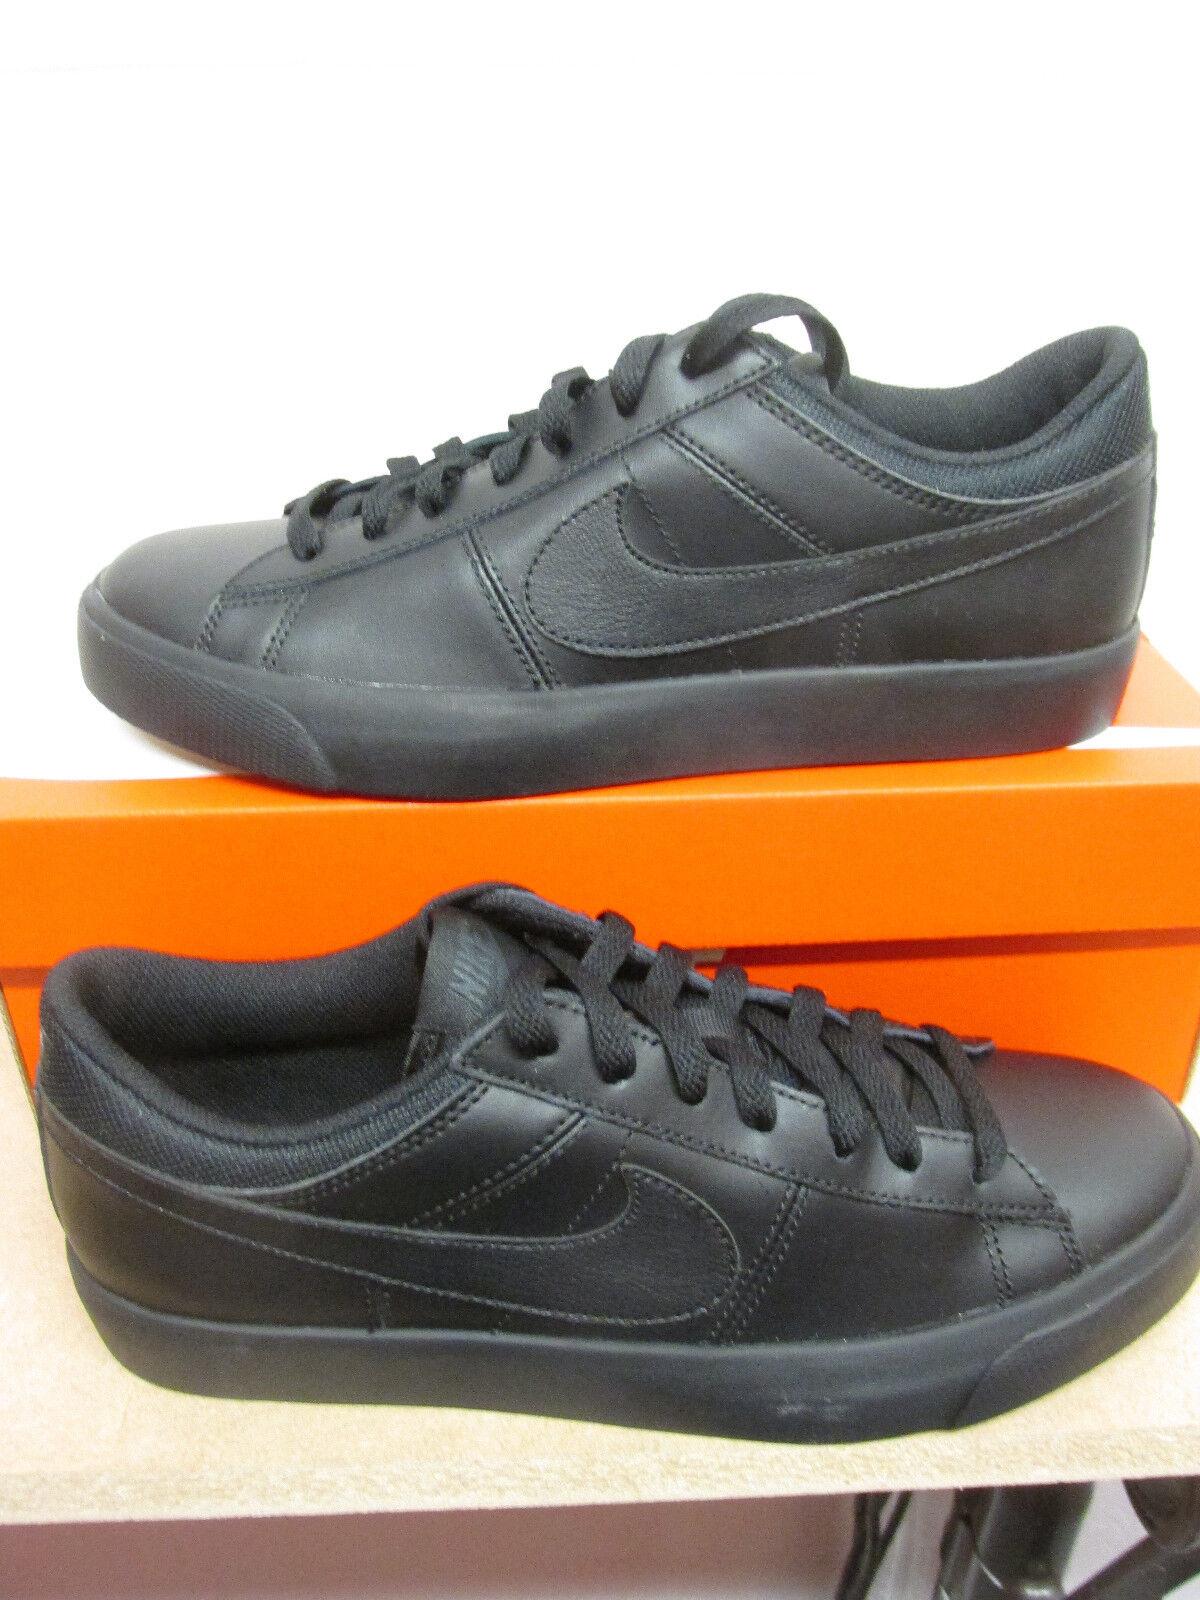 Nike Match Supreme LTR Scarpe sportive uomo 631656 020 Scarpe da tennis